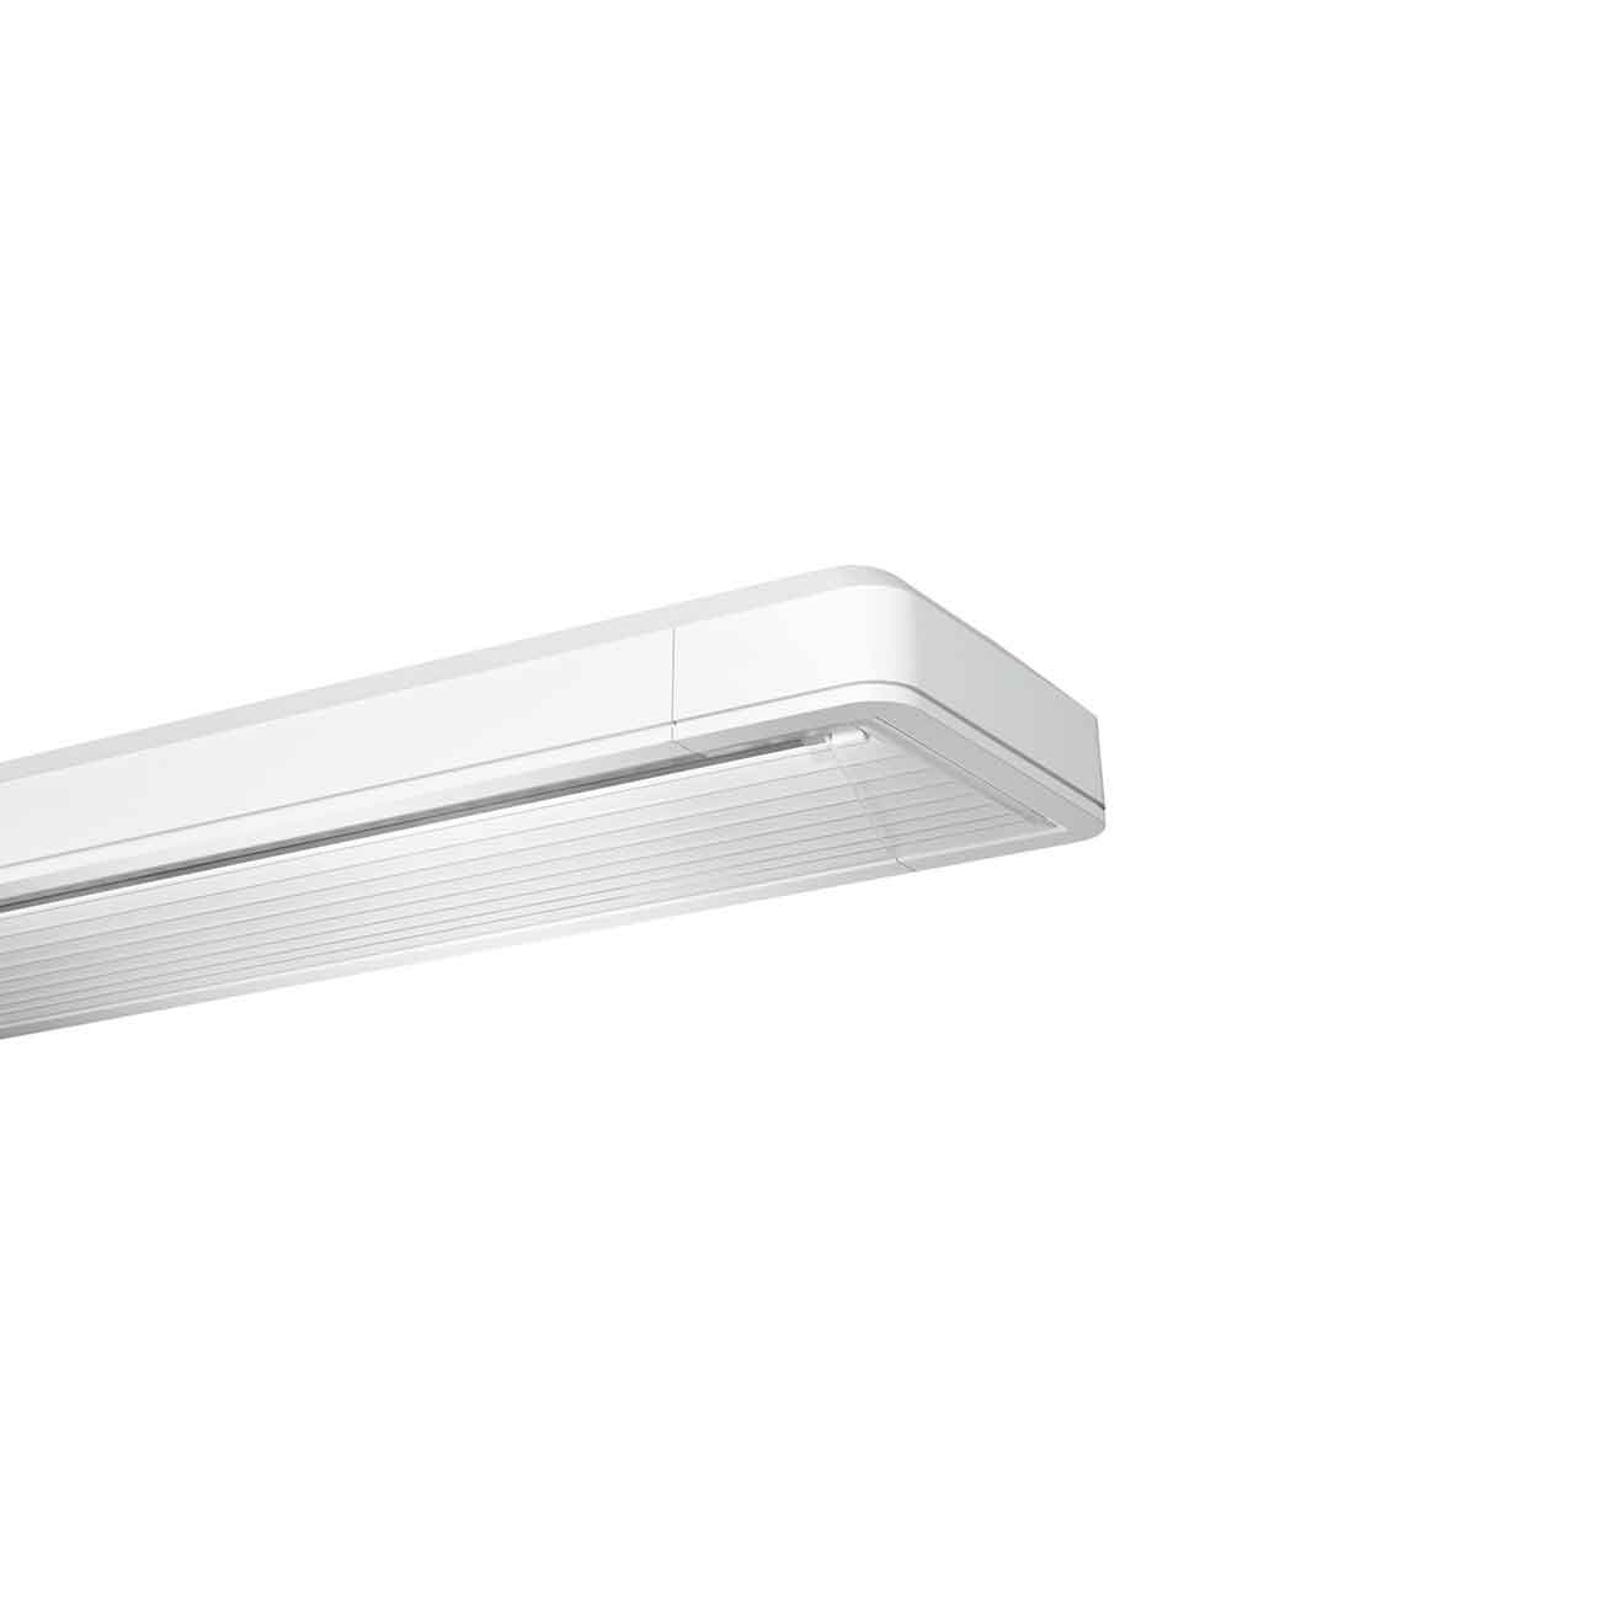 Siteco Taris LED-Deckenleuchte 123cm EVG-DALI